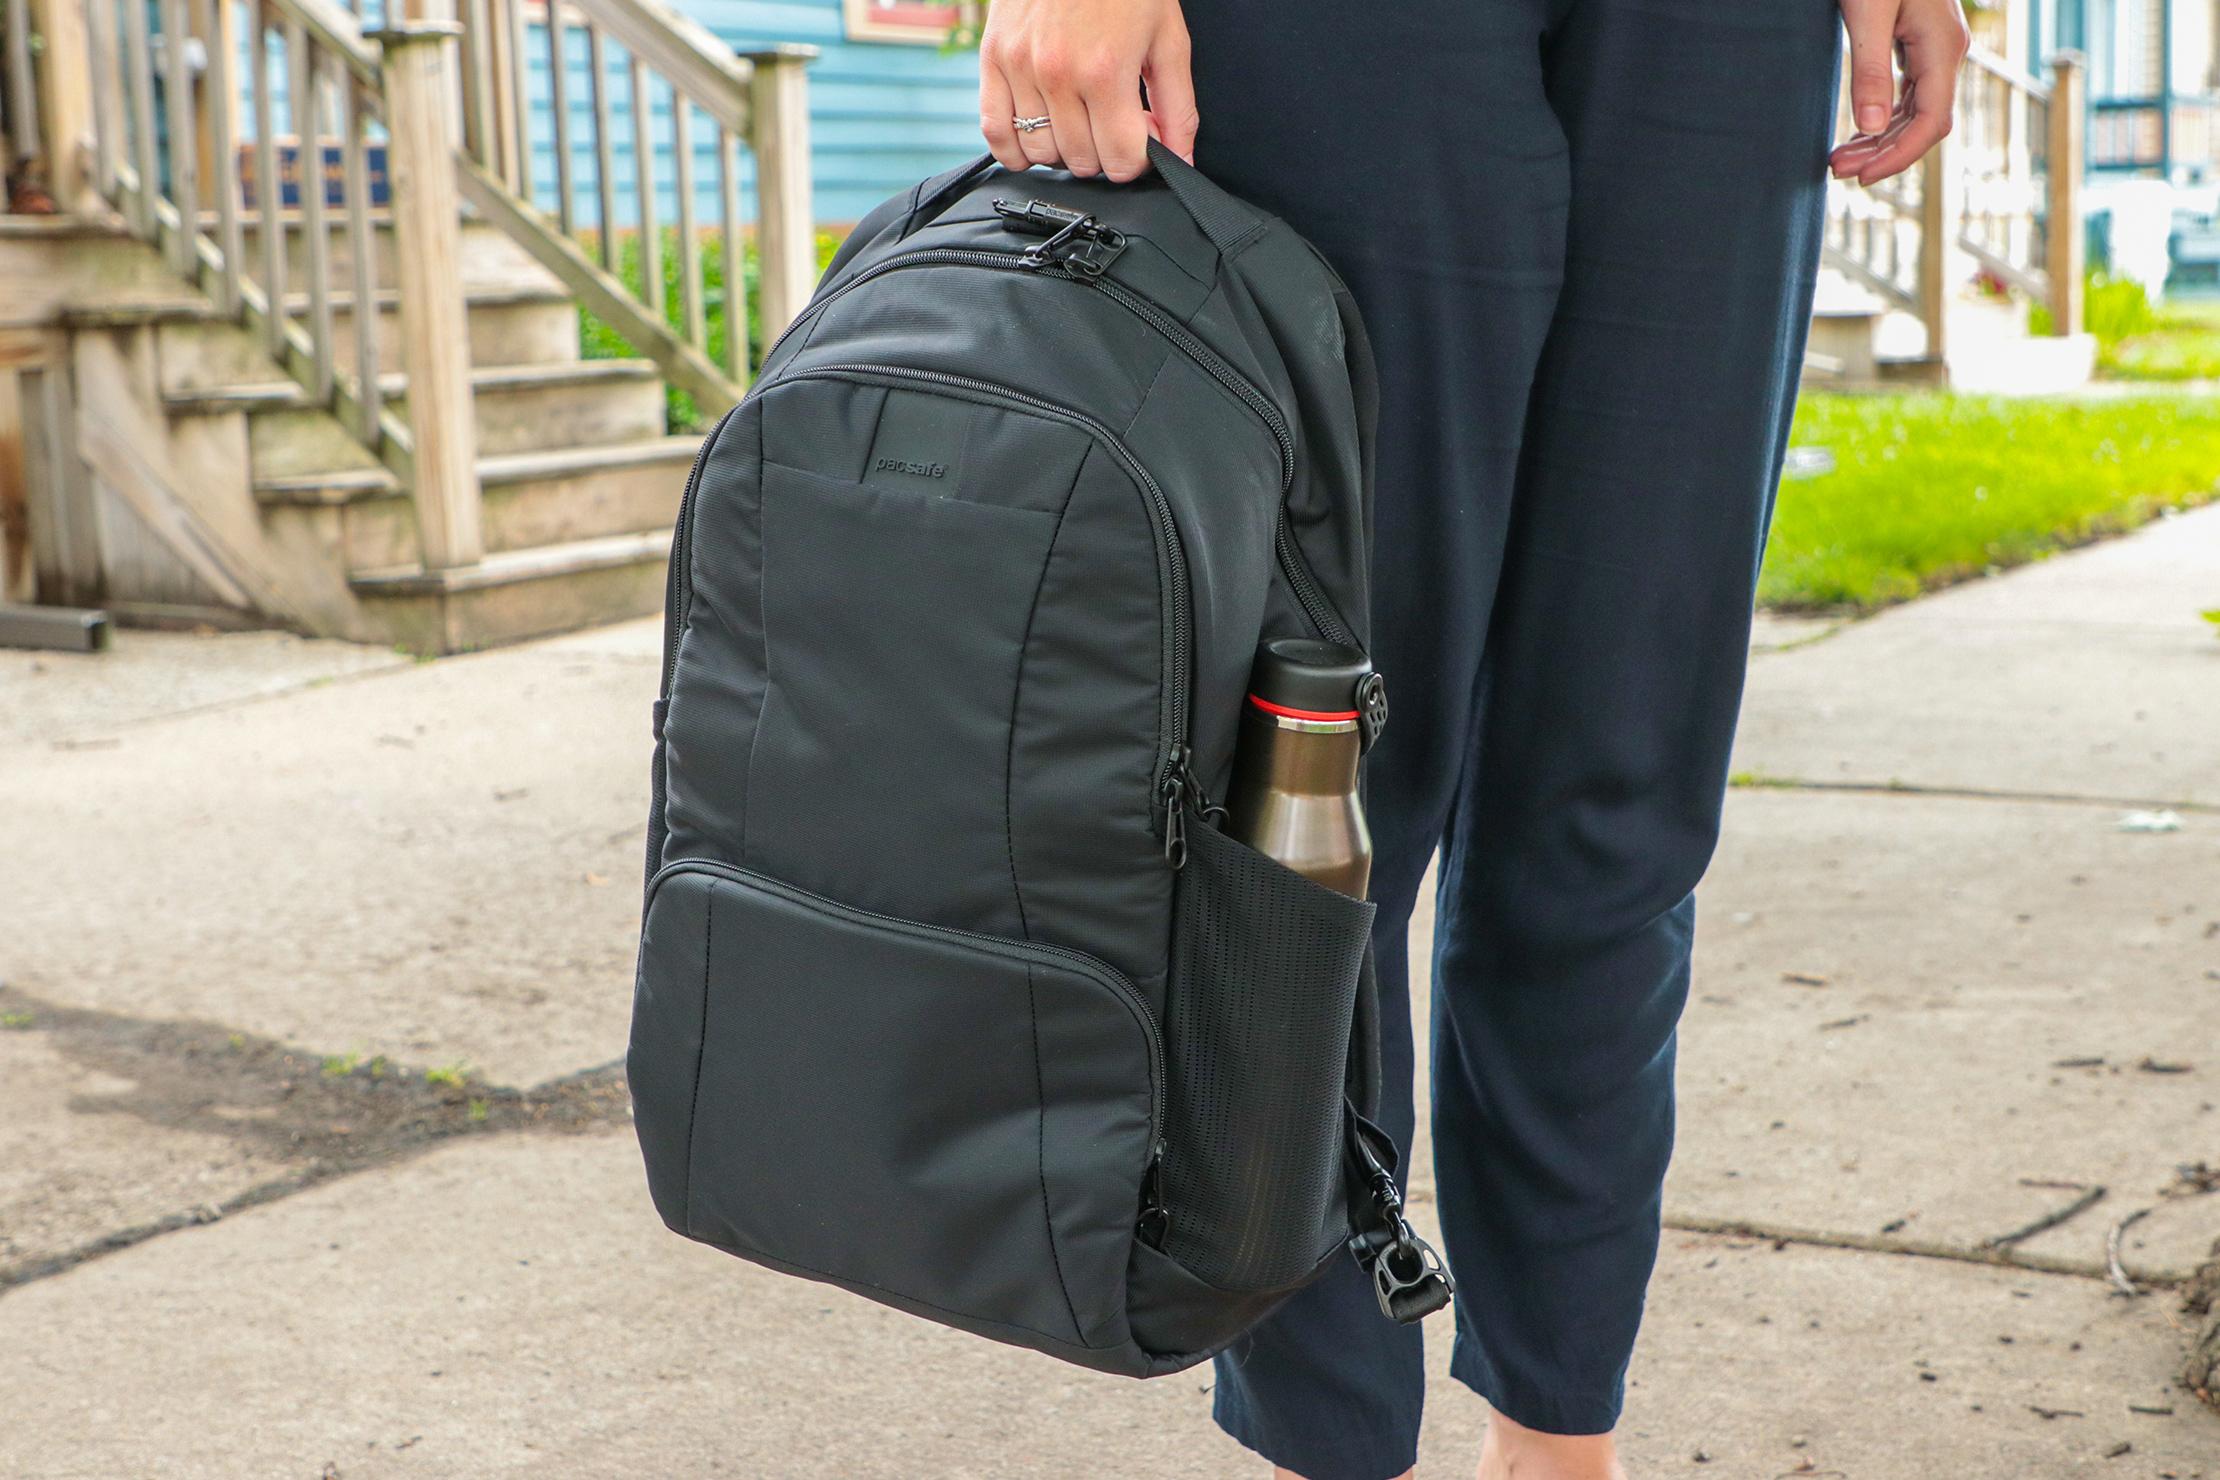 Pacsafe Metrosafe LS450 Anti-Theft Backpack Usage 3